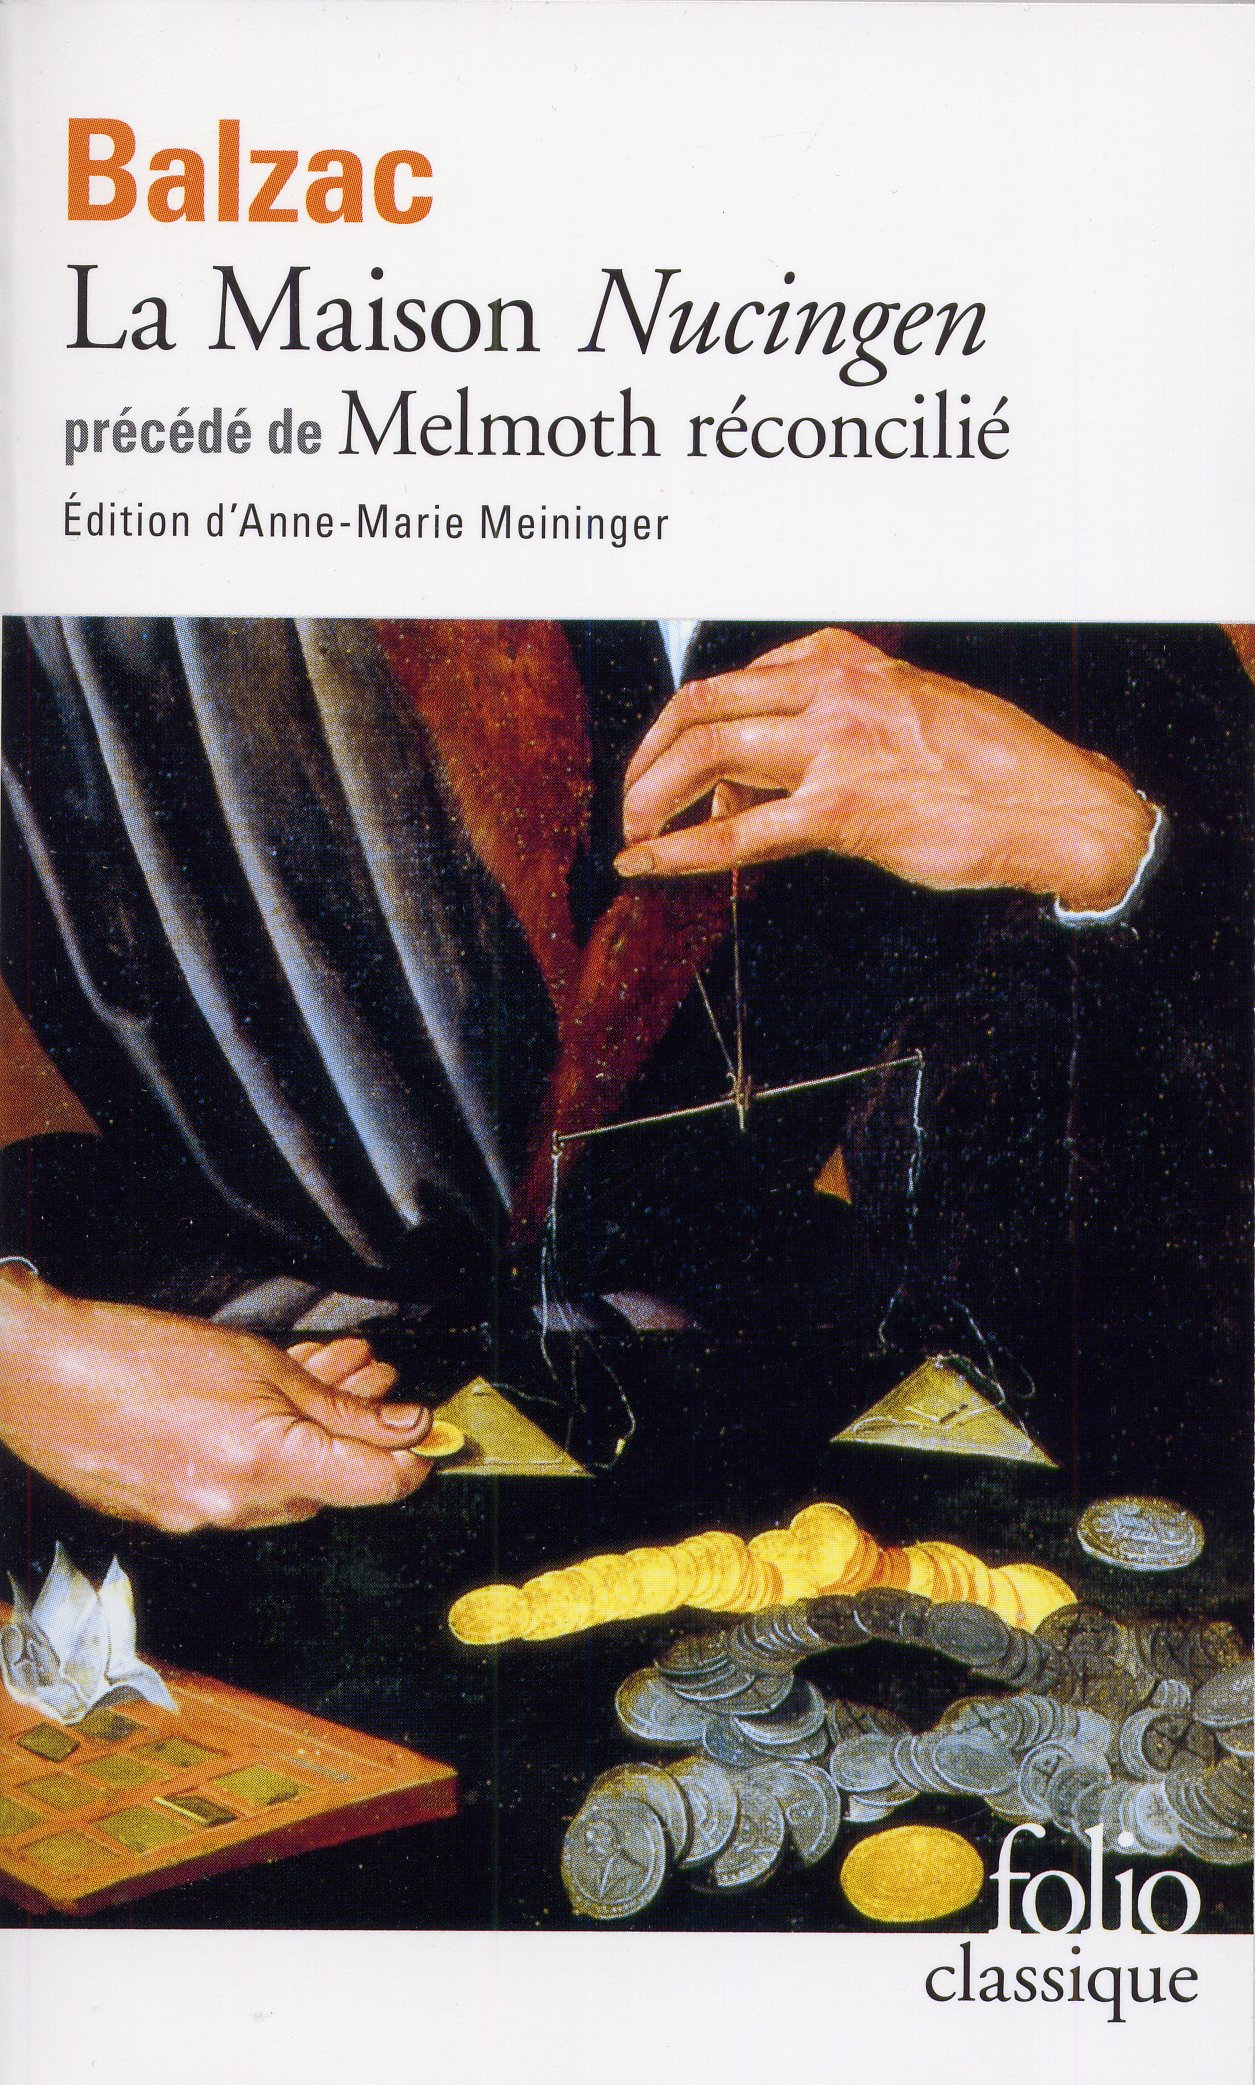 La Maison Nucingen Folio Classique Amazon Co Uk Honore De Balzac  Books